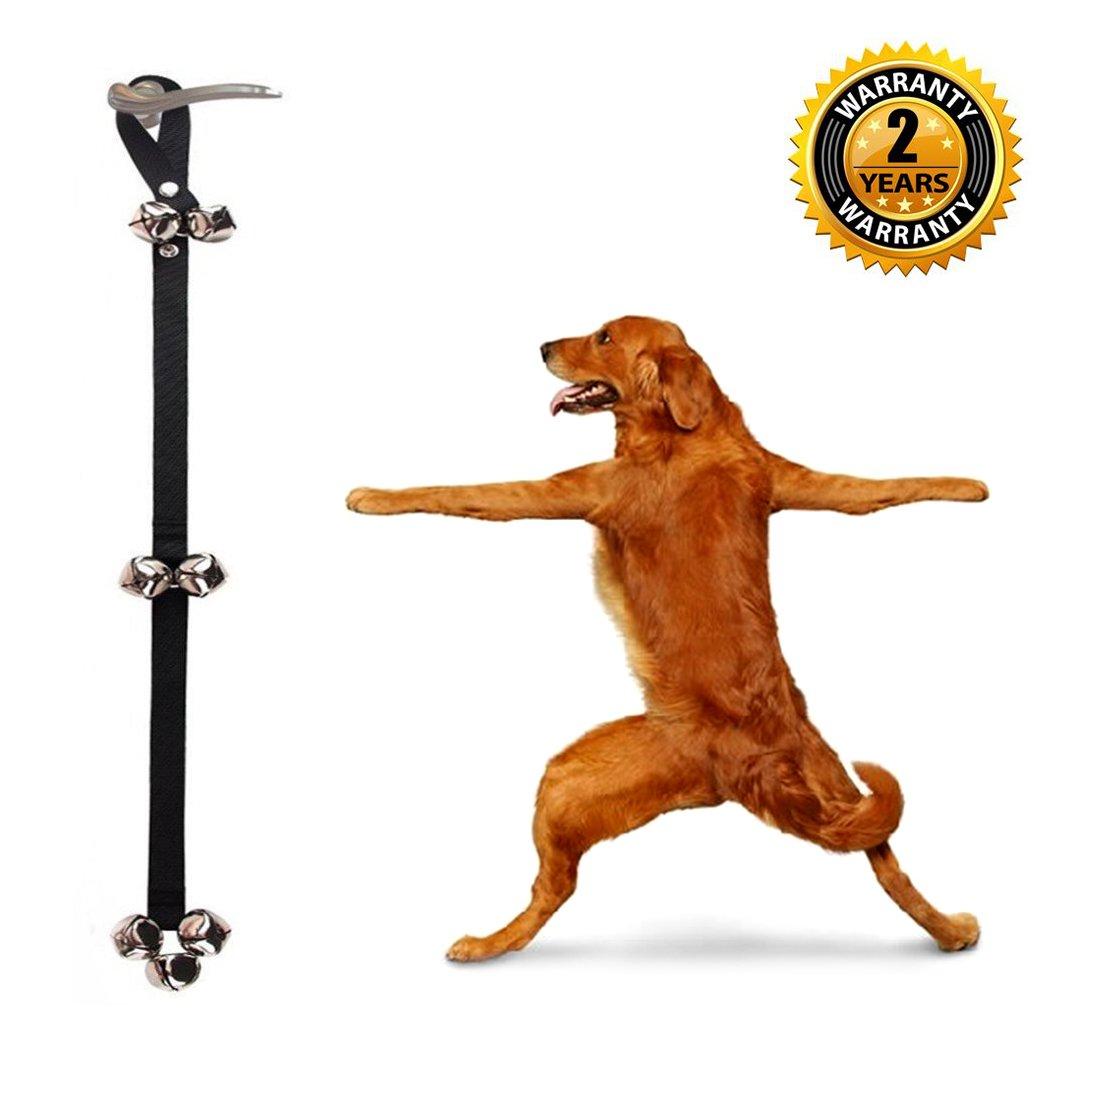 Dog Doorbells Potty Training Bells-for House Training